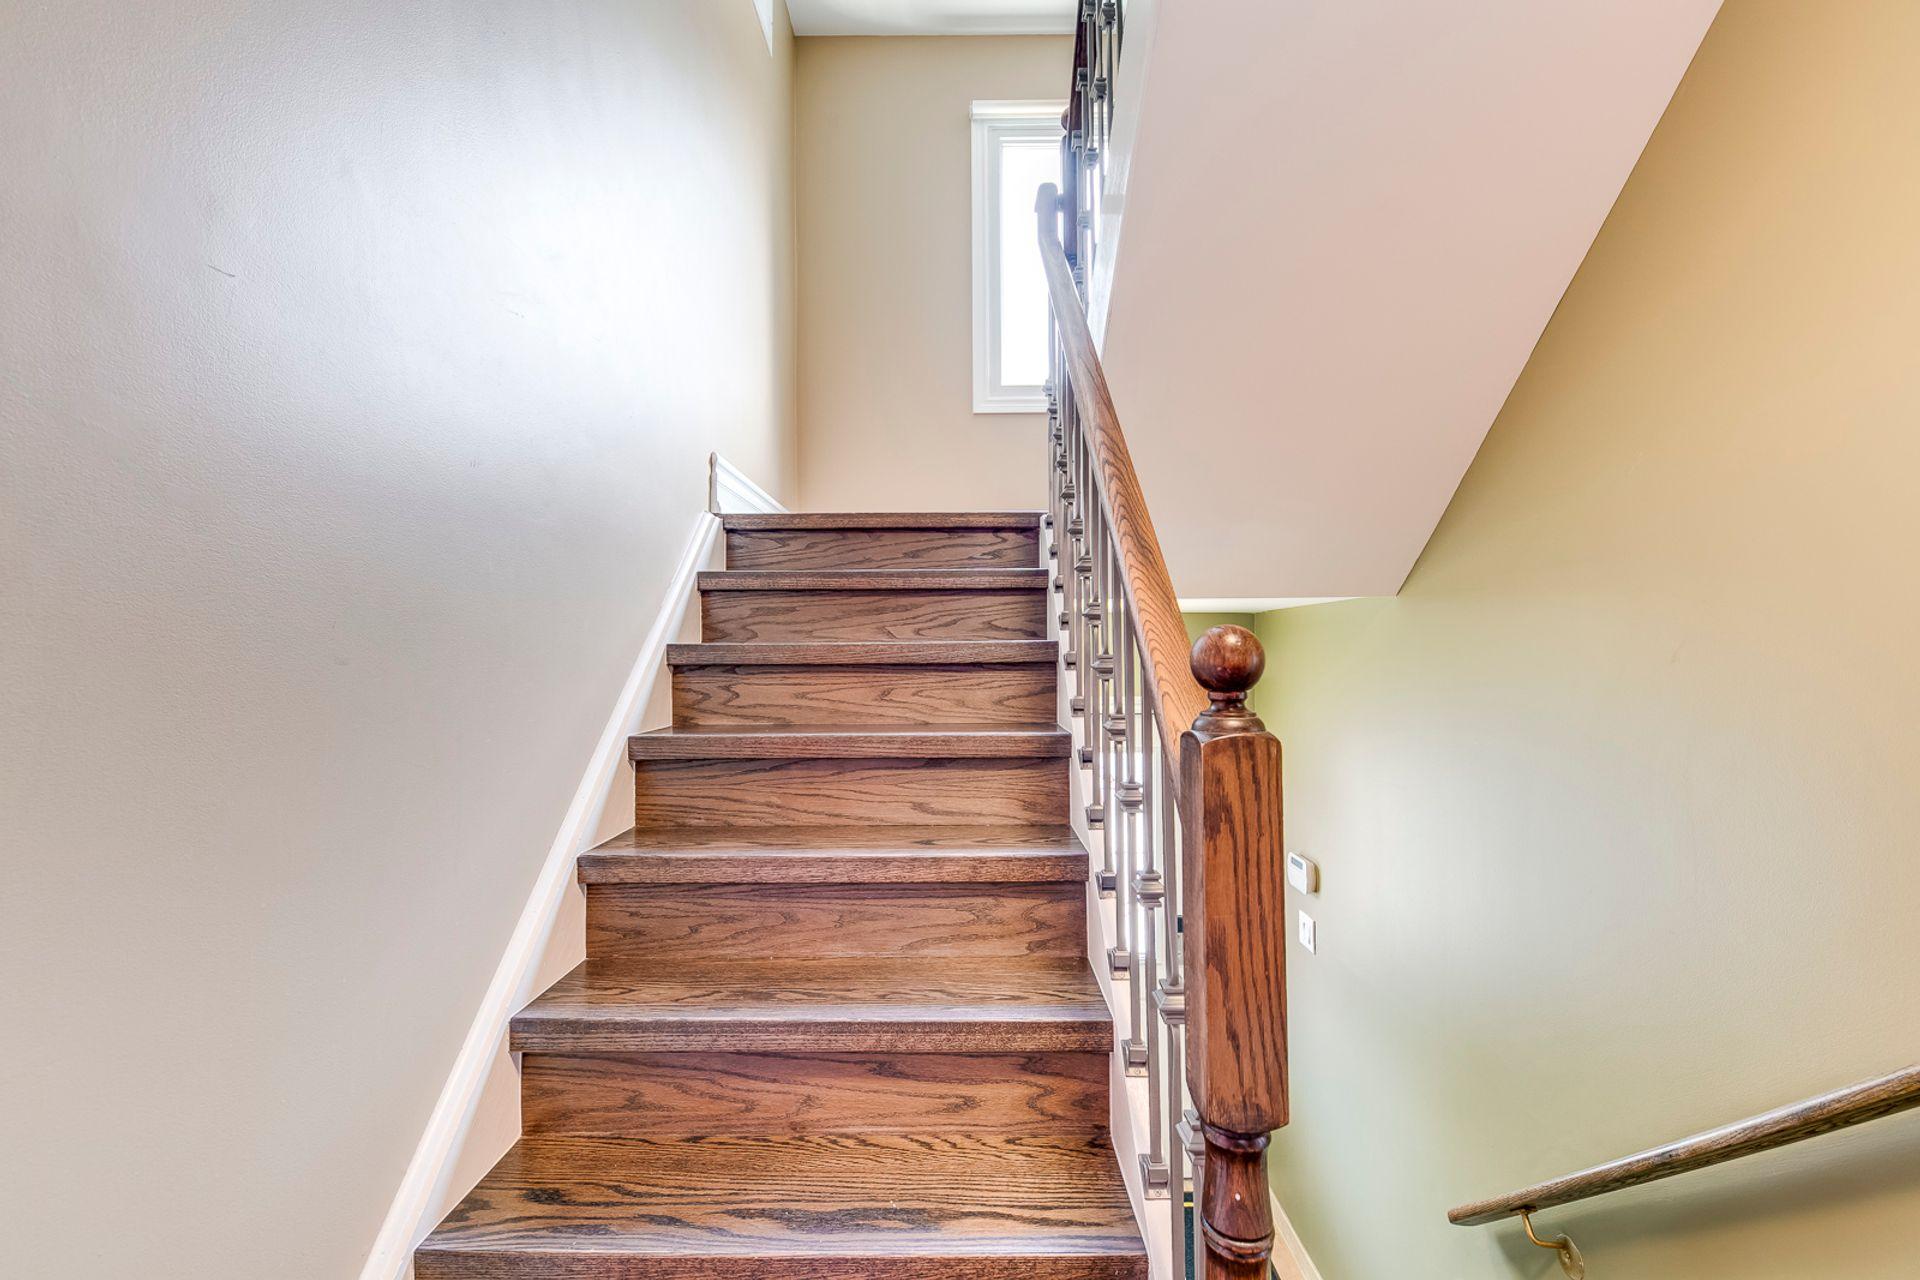 Stairs - 7 - 840 Dundas St W, Mississauga - Elite3 & Team at 7 - 840 Dundas Street W, Erindale, Mississauga